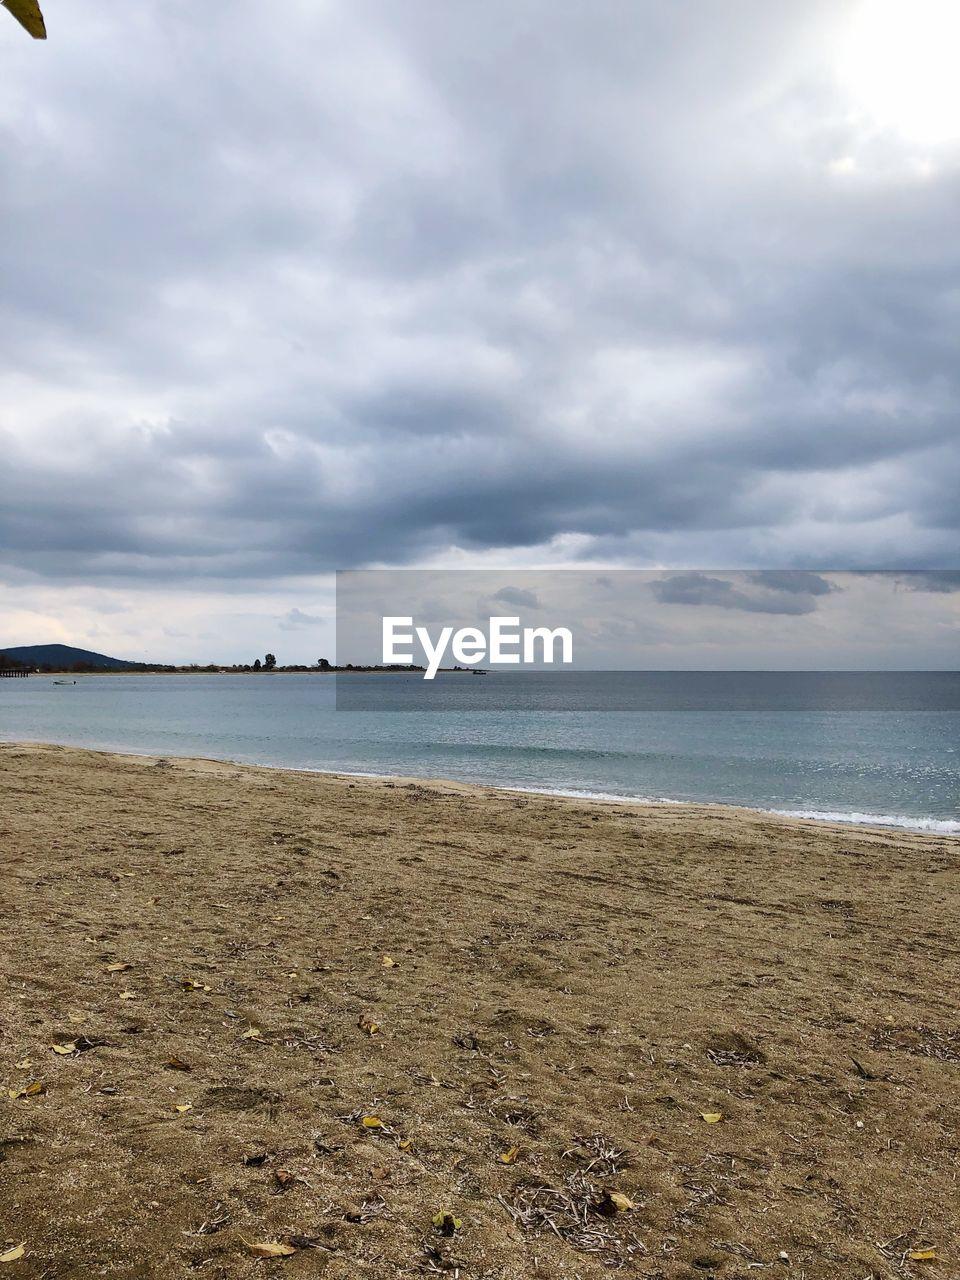 sea, water, sky, land, beach, cloud - sky, scenics - nature, beauty in nature, horizon over water, tranquil scene, horizon, sand, tranquility, nature, day, no people, outdoors, non-urban scene, idyllic